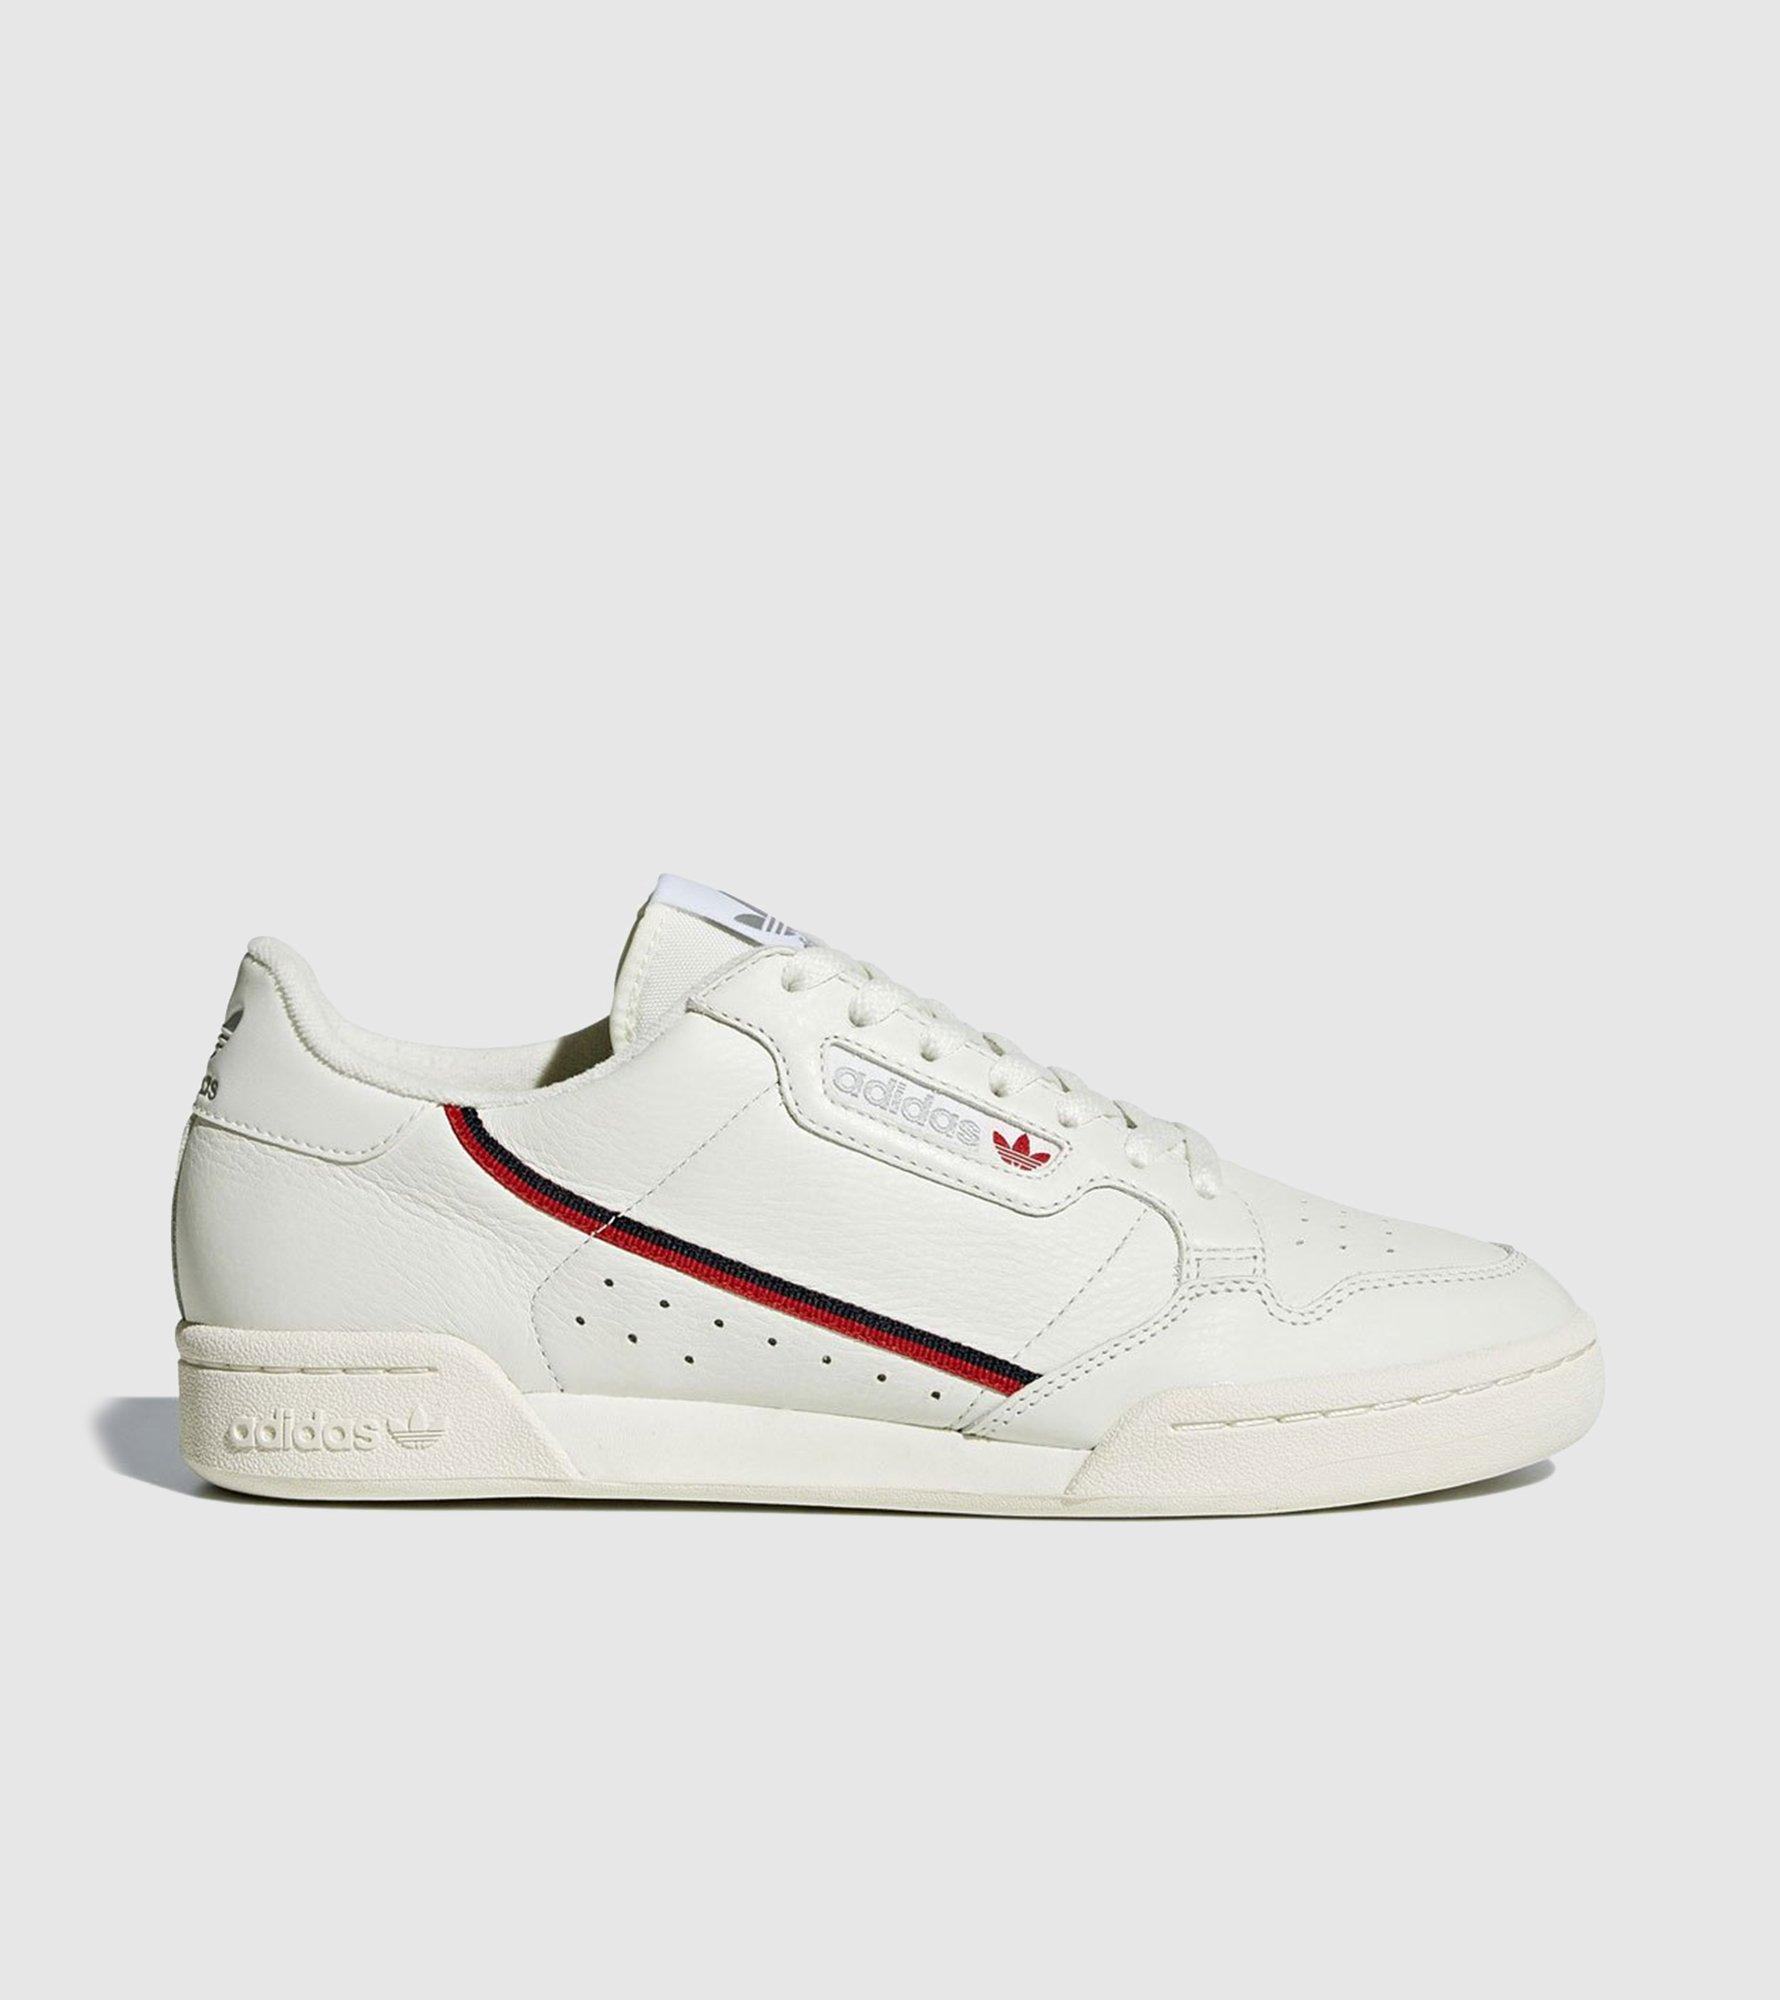 84562fac1 Adidas Originals Continental 80 in White for Men - Lyst